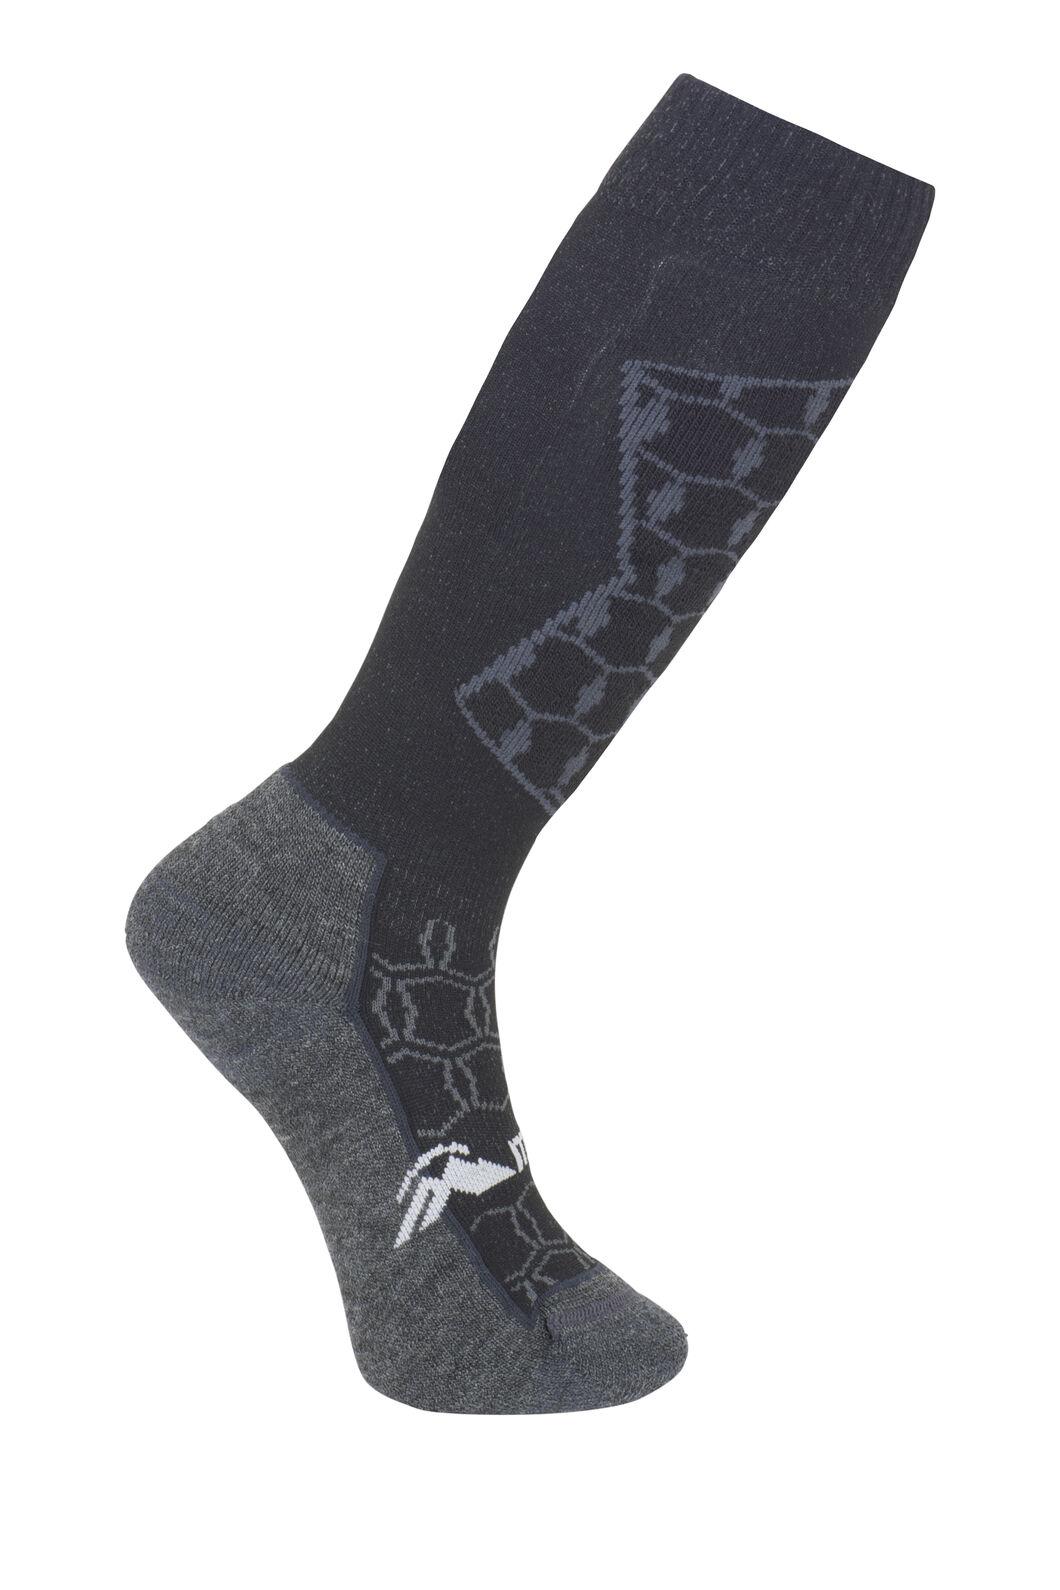 Macpac Tech Ski Sock - Kids', Black/Charcoal, hi-res